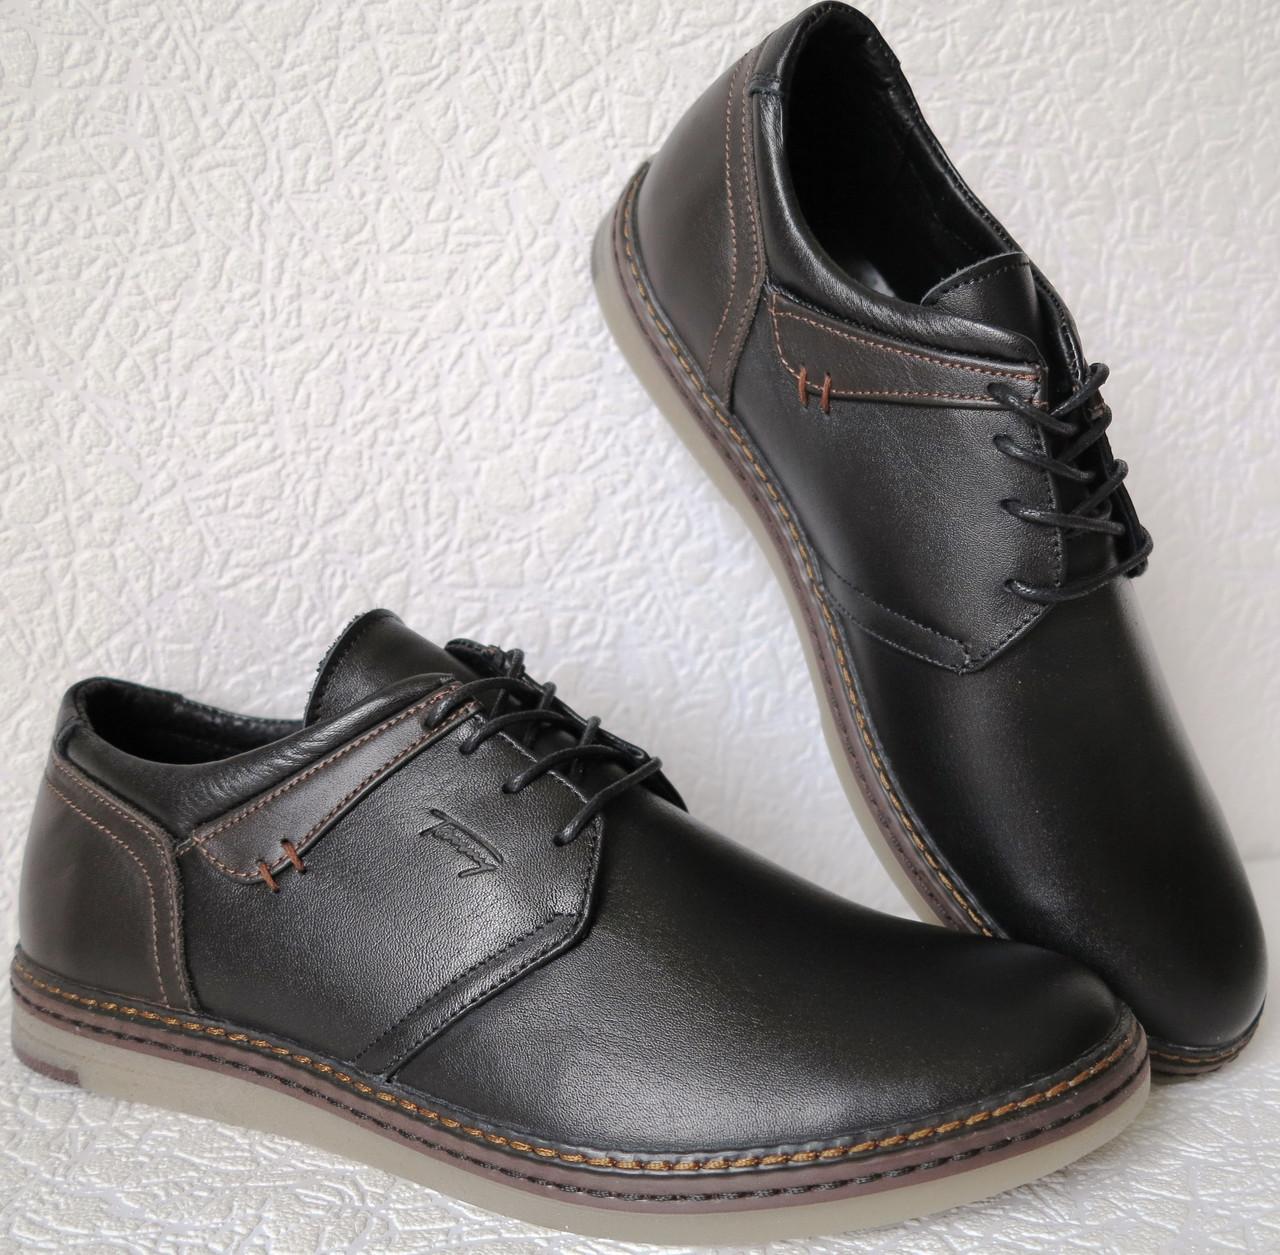 715b1303cead Tommy Hilfiger мужские черно коричневые кожаные мужские casual туфли